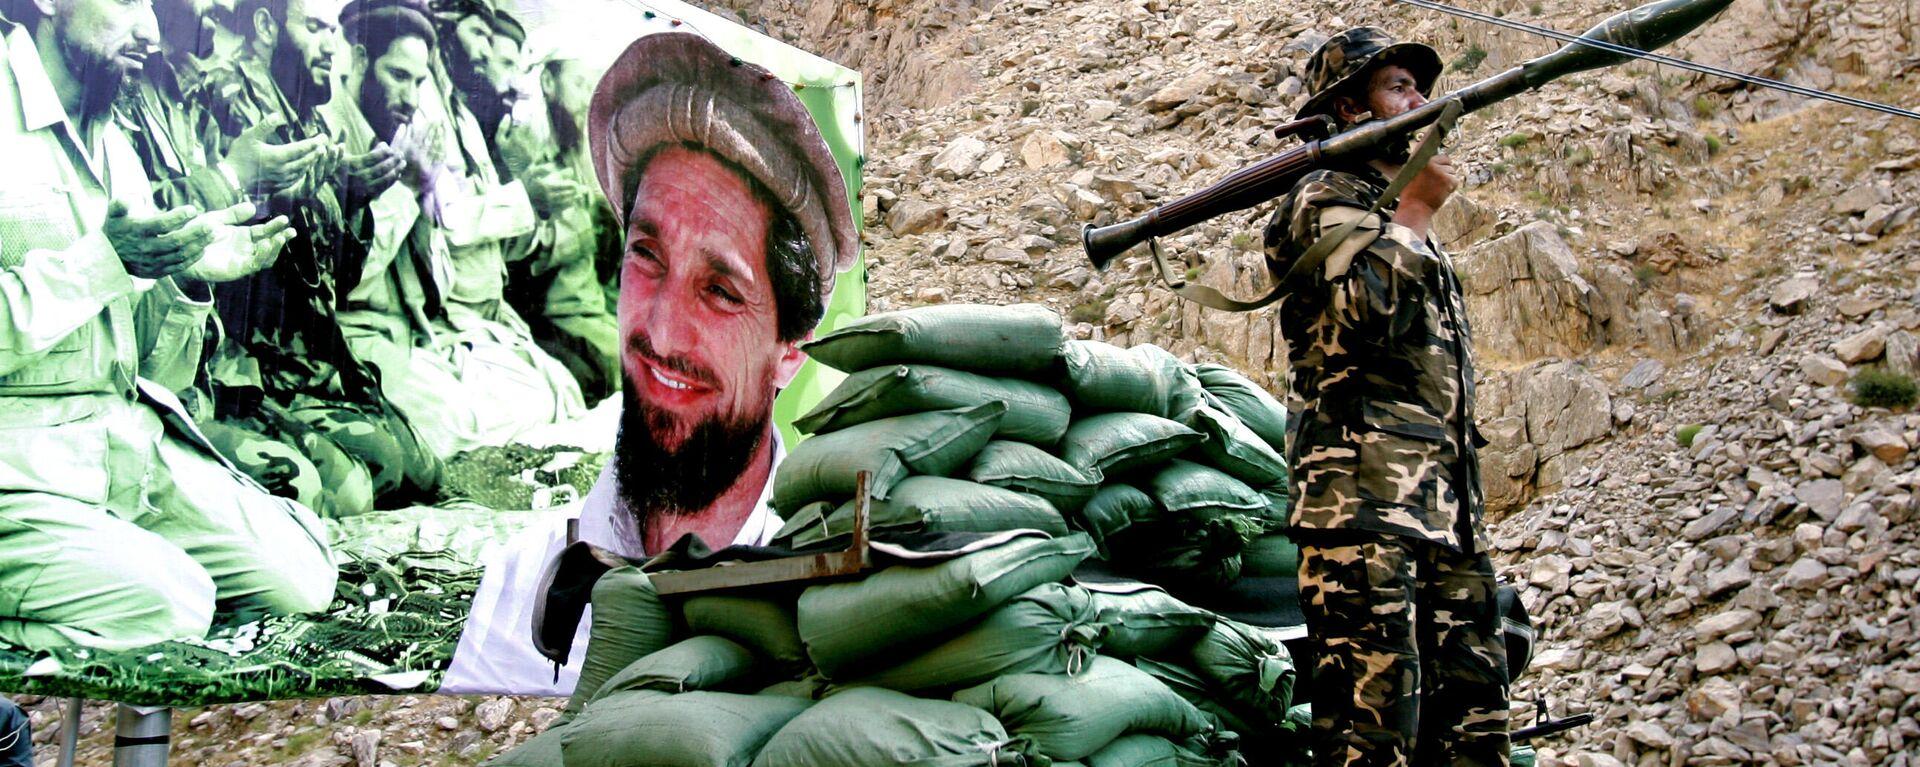 Resistenza afghana ai talebani nel Panjshir - Sputnik Italia, 1920, 06.09.2021